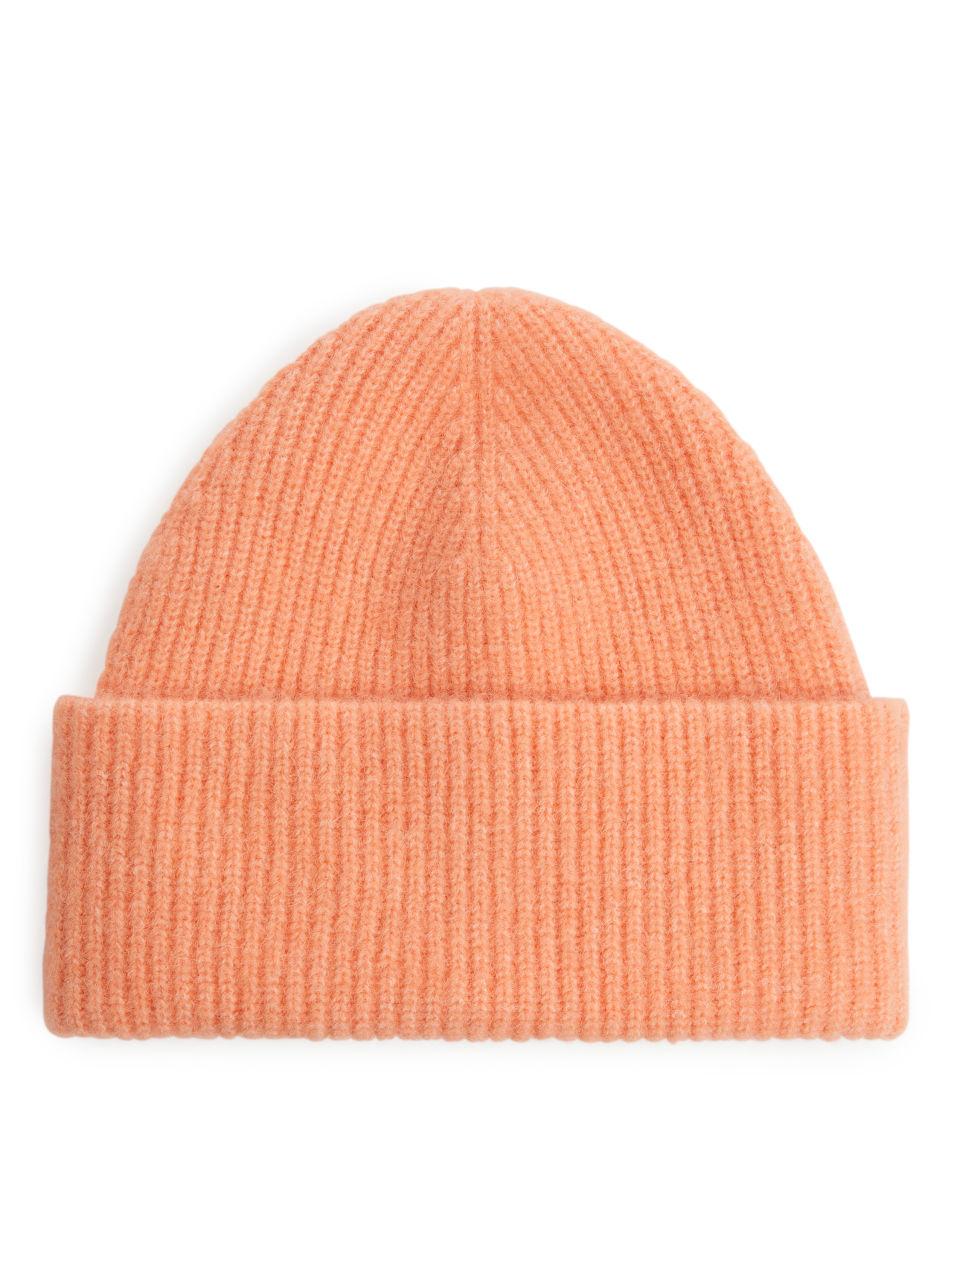 Half-Cardigan Alpaca Merino Beanie - Orange